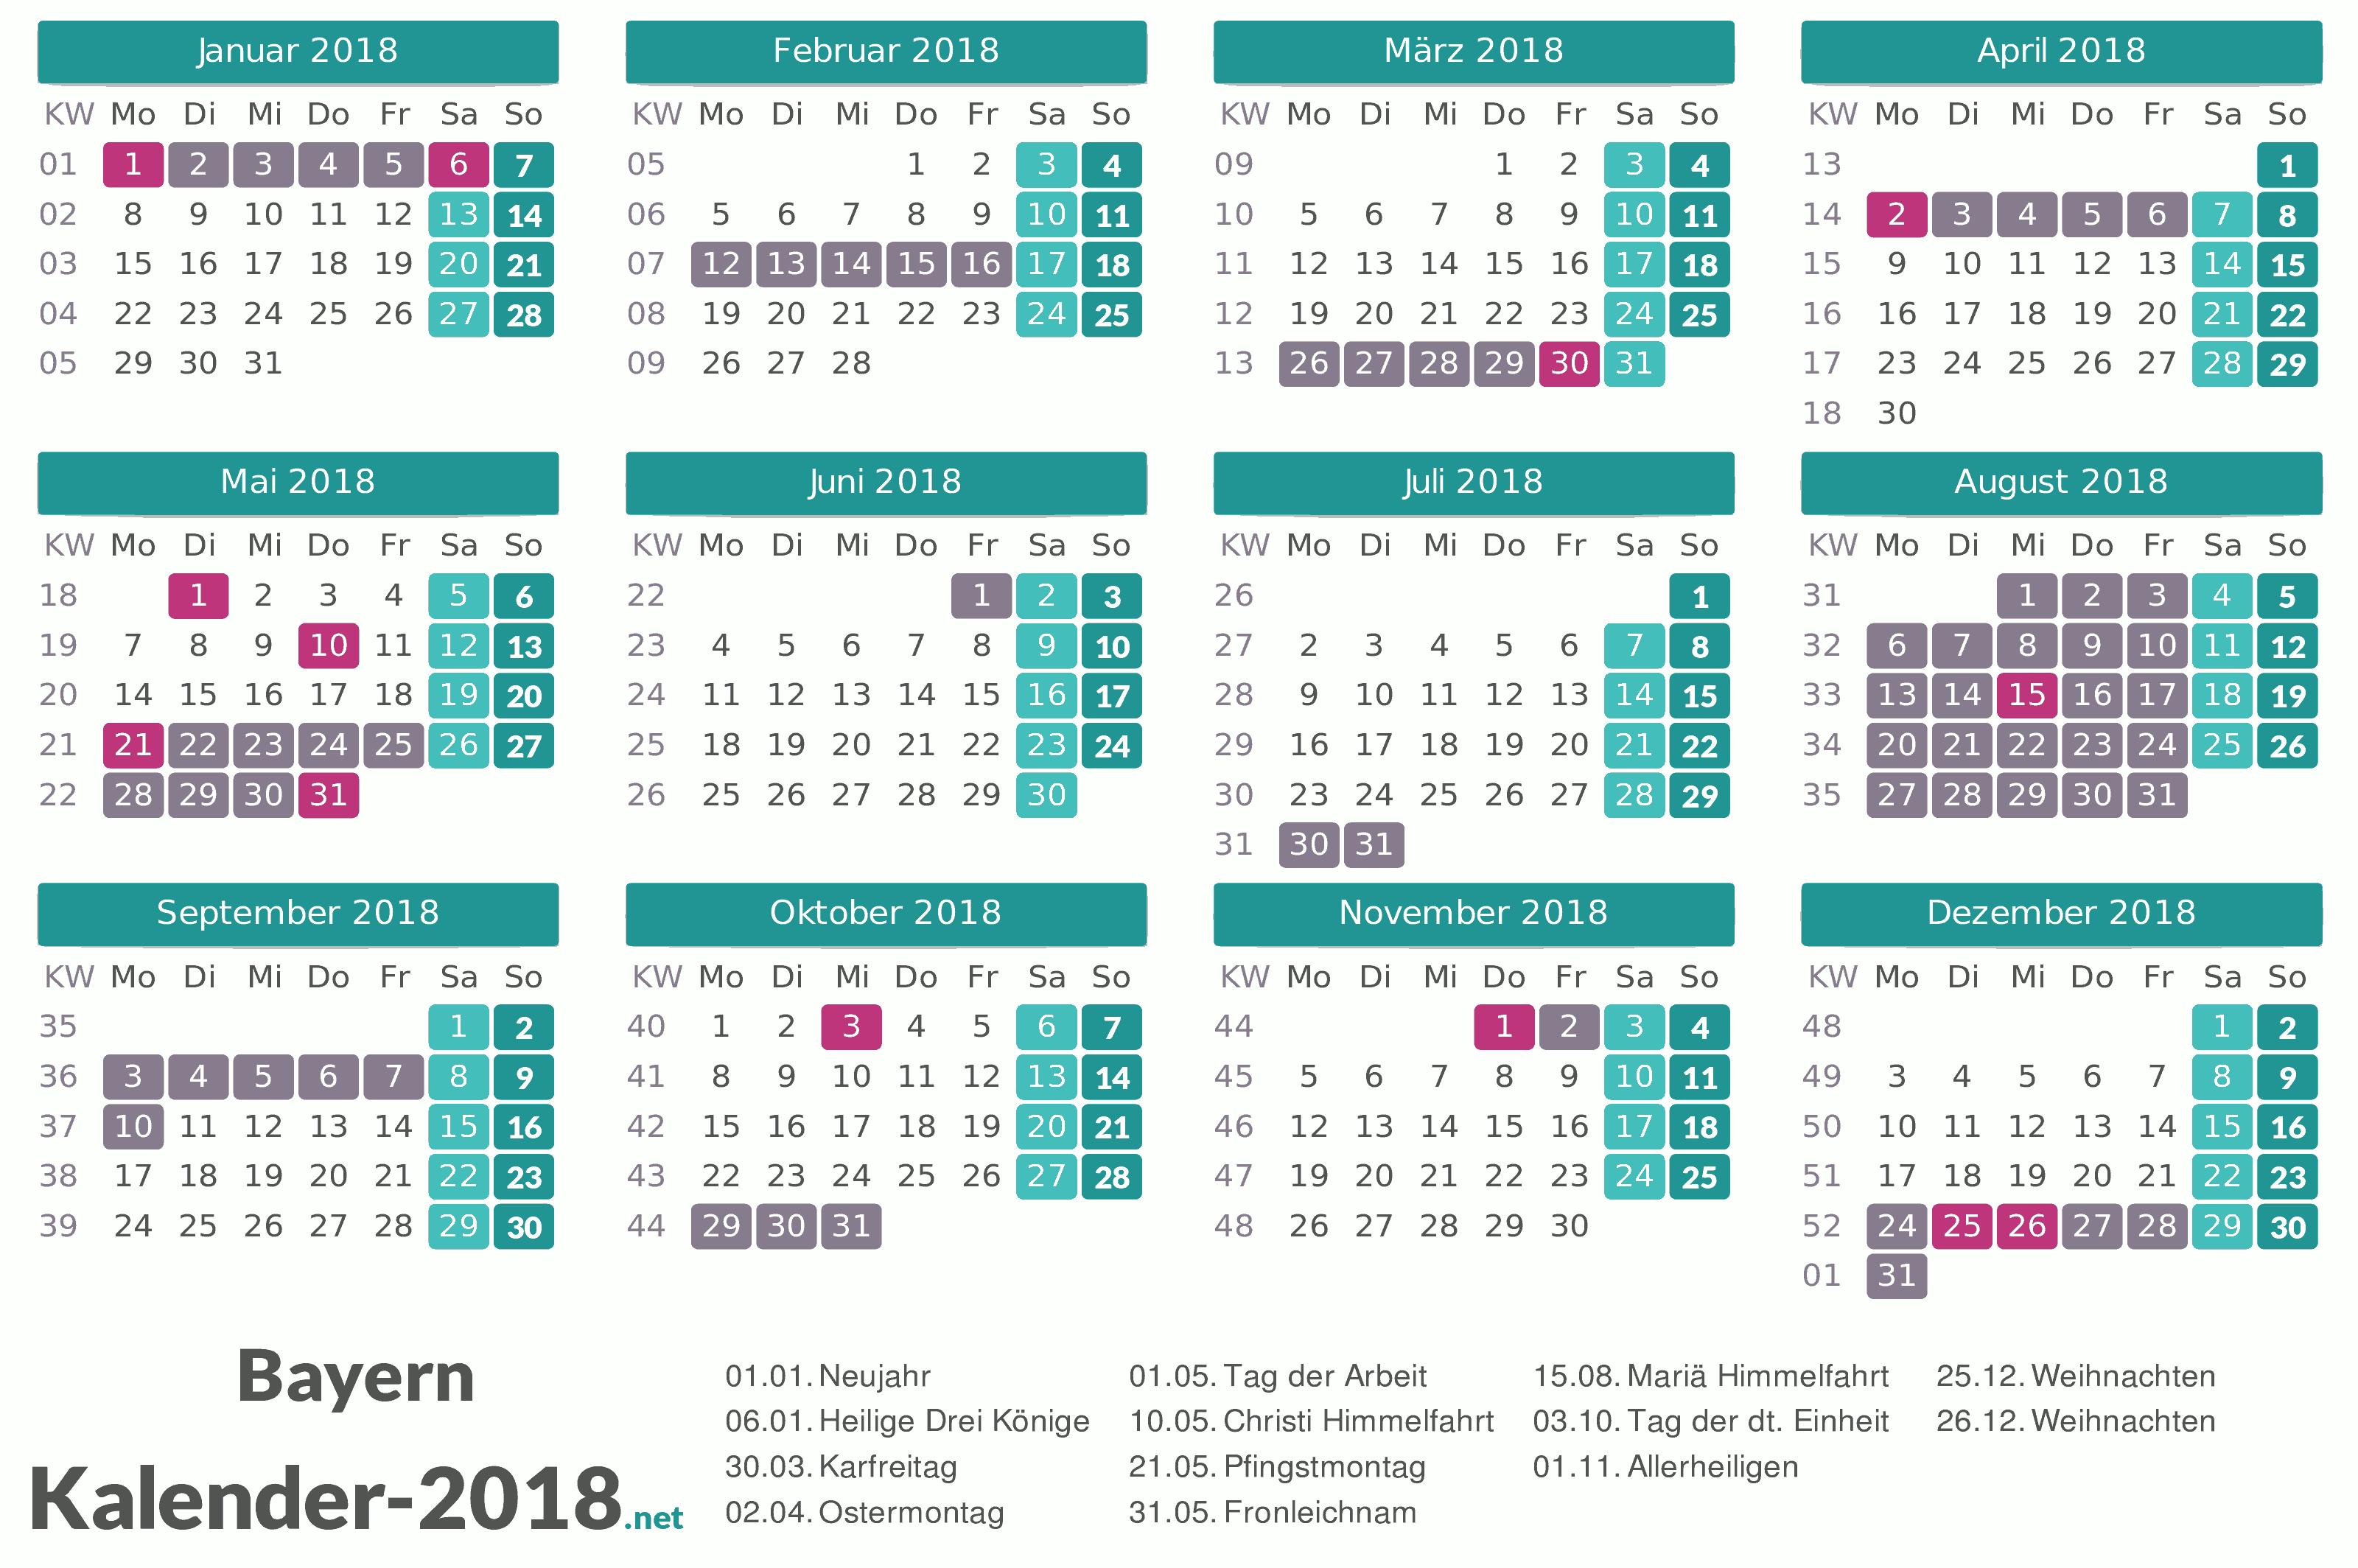 ferien bayern 2018 ferienkalender bersicht. Black Bedroom Furniture Sets. Home Design Ideas